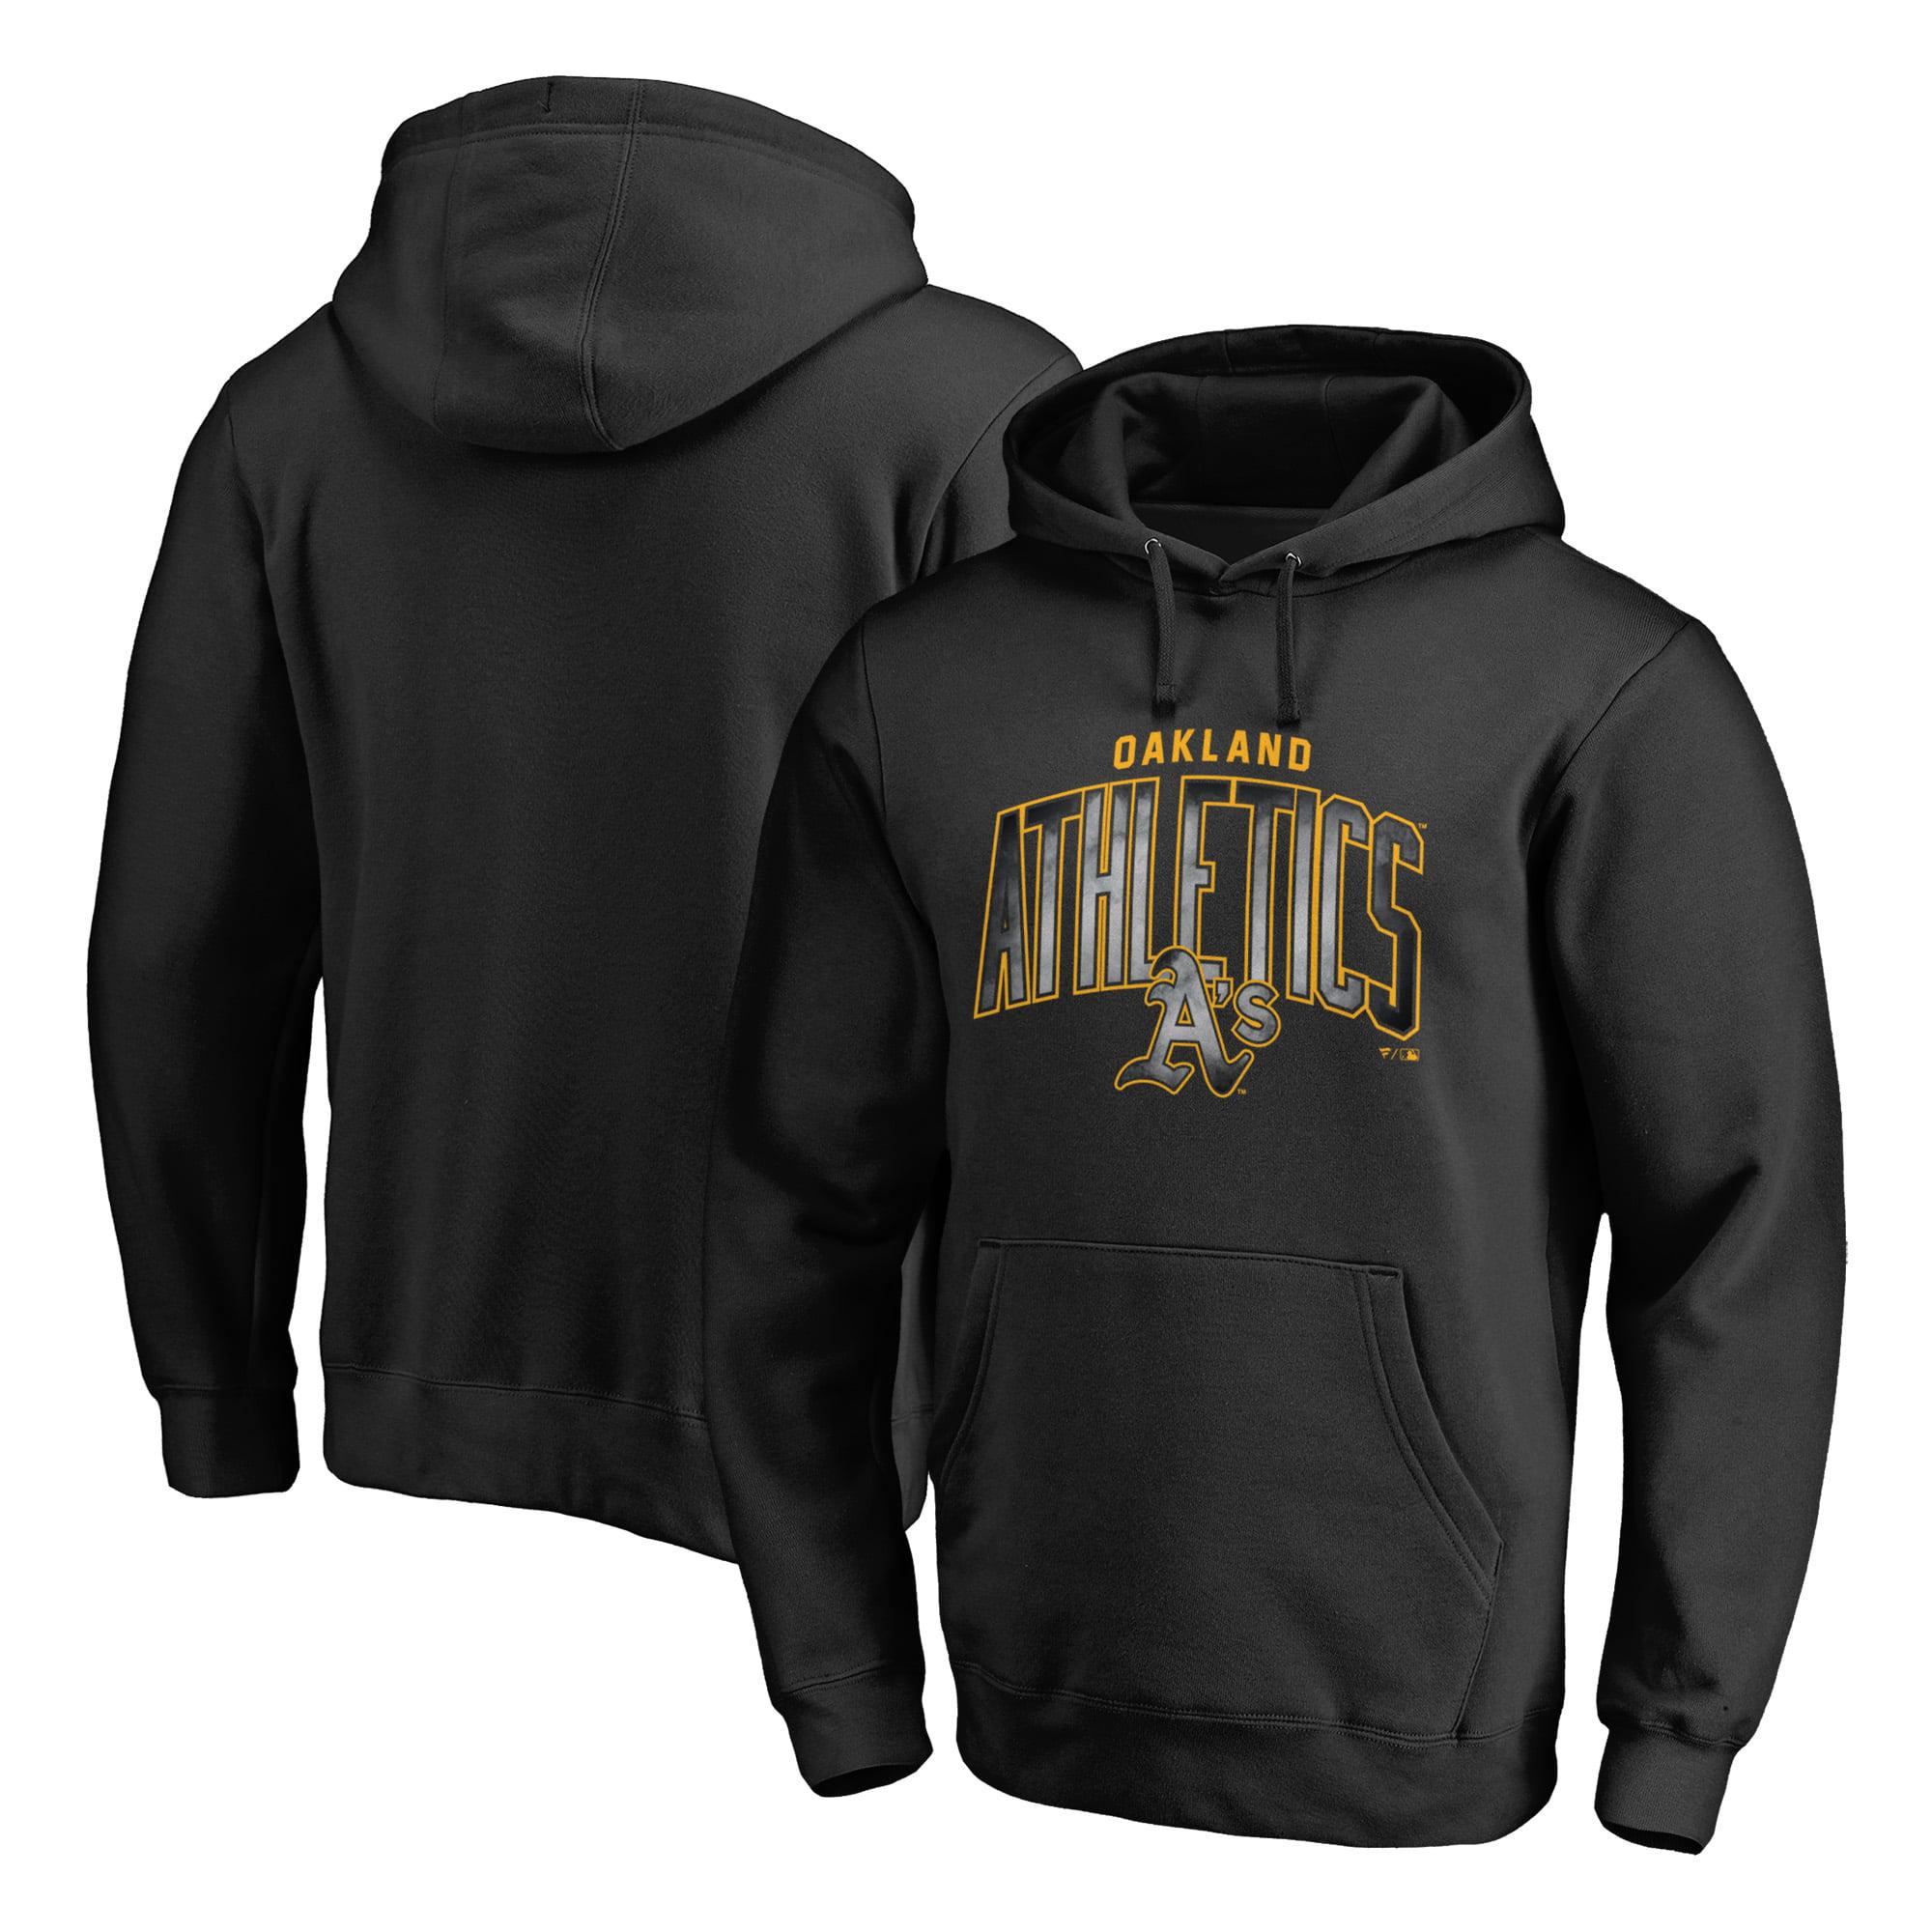 Oakland Athletics Fanatics Branded Big & Tall Arch Smoke Pullover Hoodie - Black